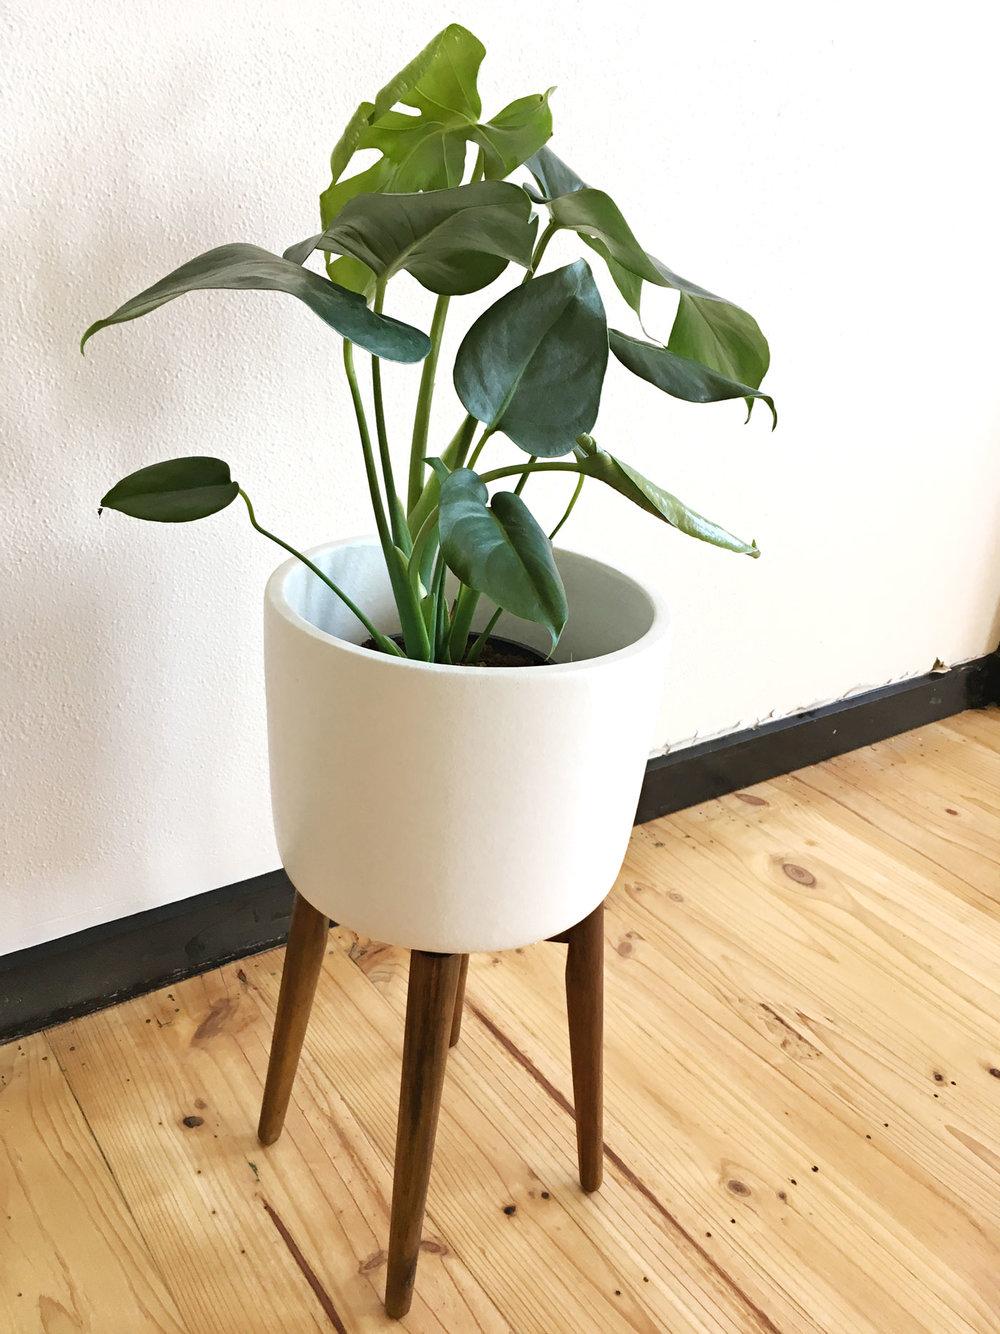 Plantstandblog.jpg